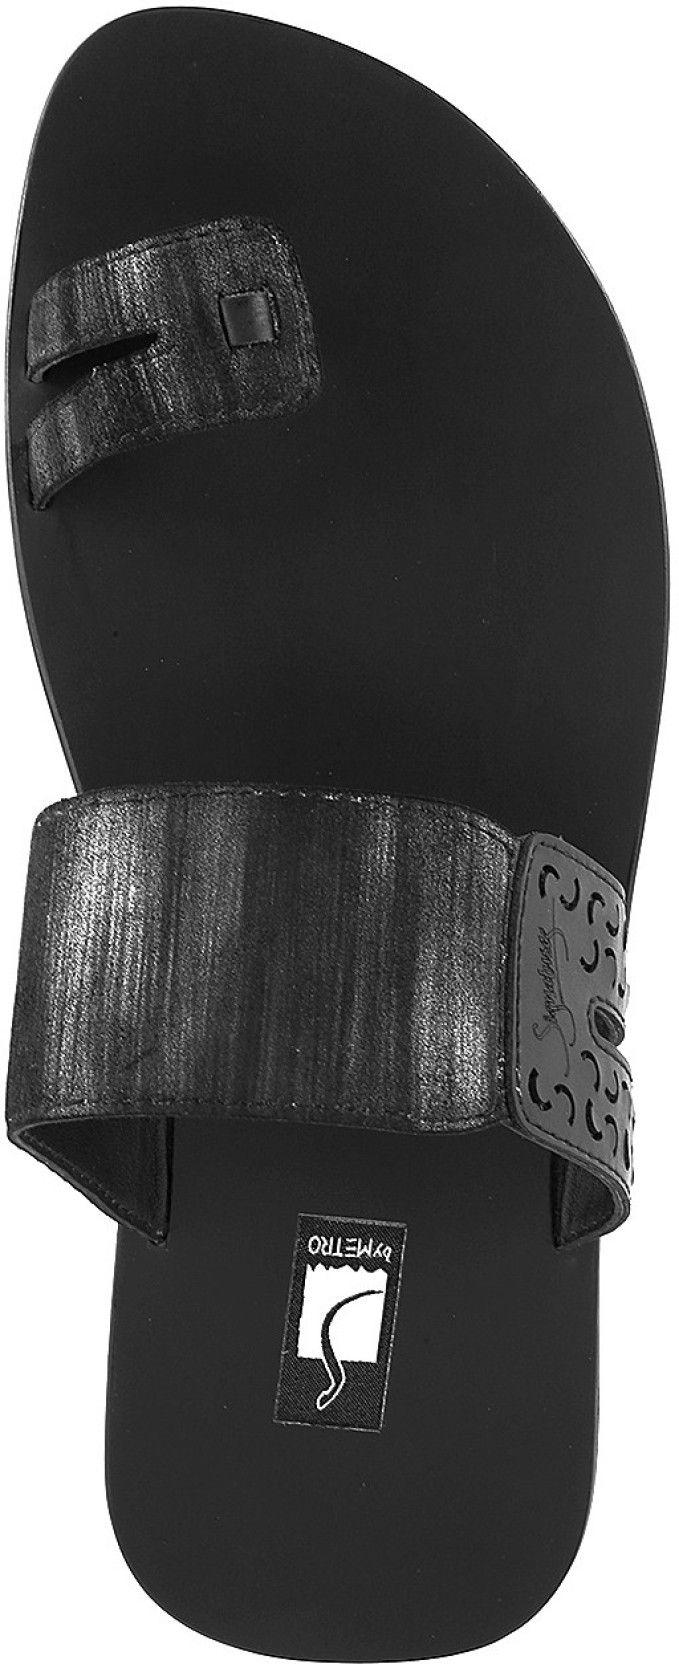 Black sandals online - Metro Men Black Sandals Buy 11 Black Color Metro Men Black Sandals Online At